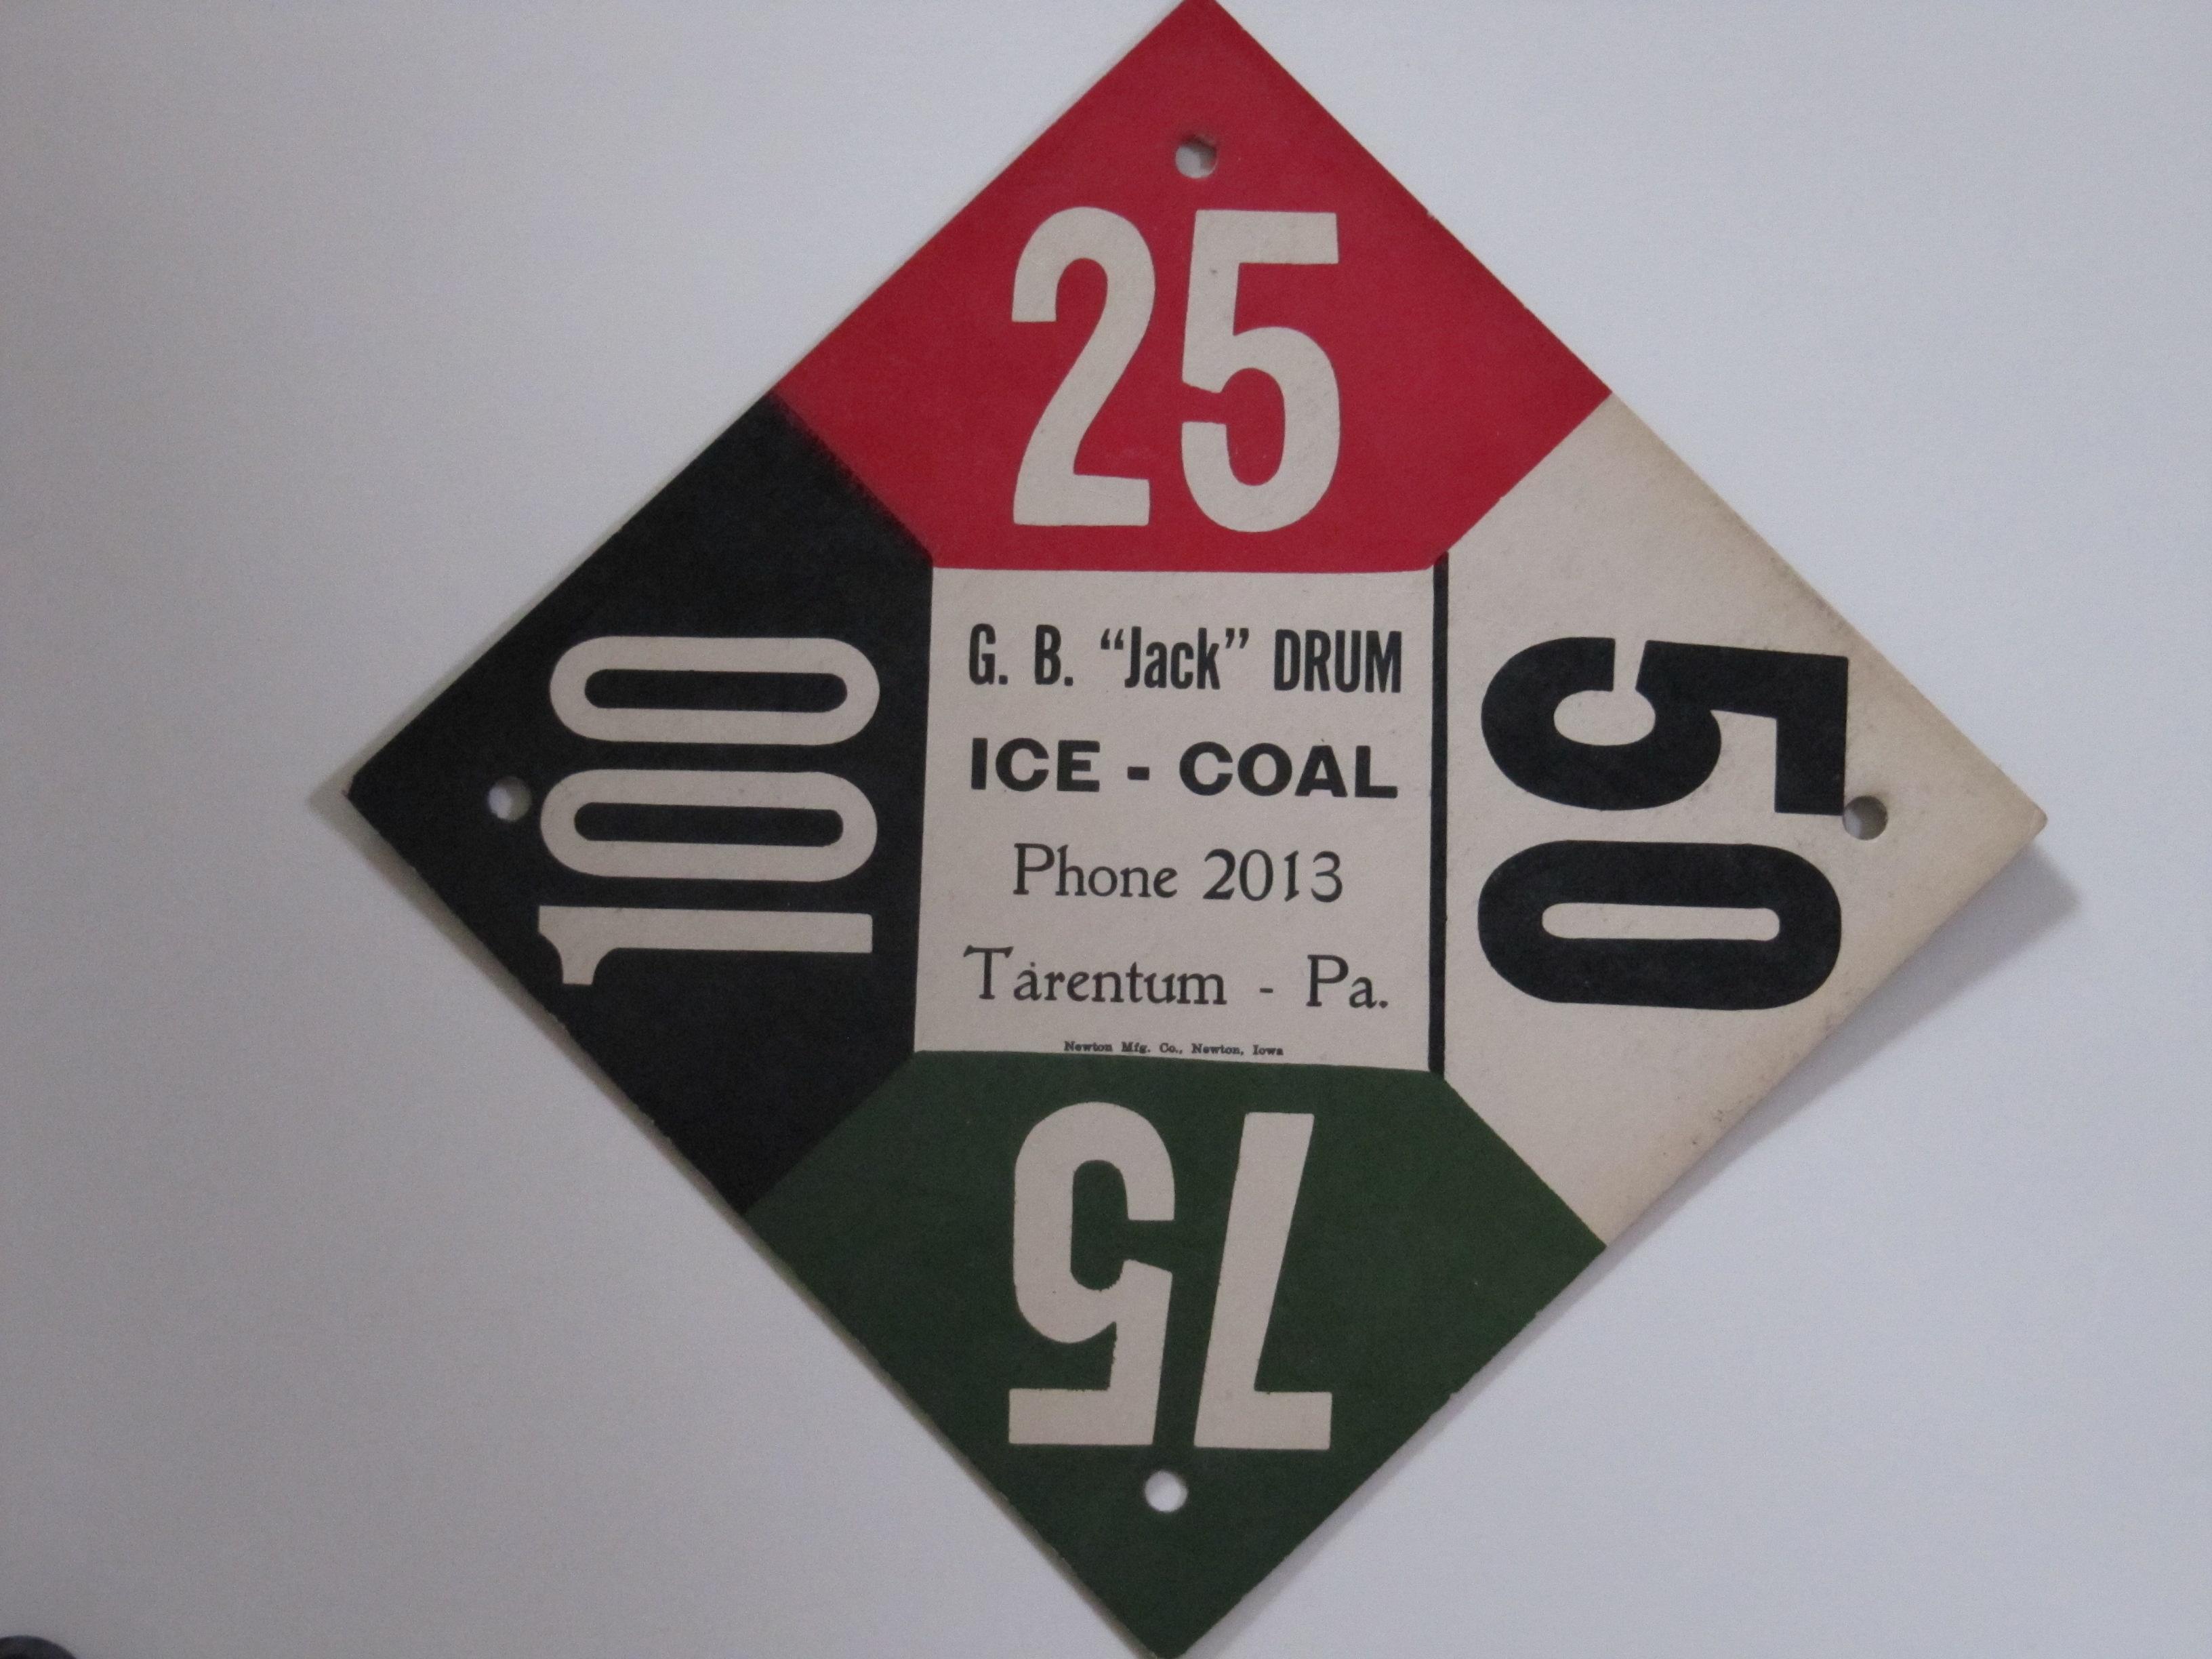 G.B.Jack Drum Ice Coal